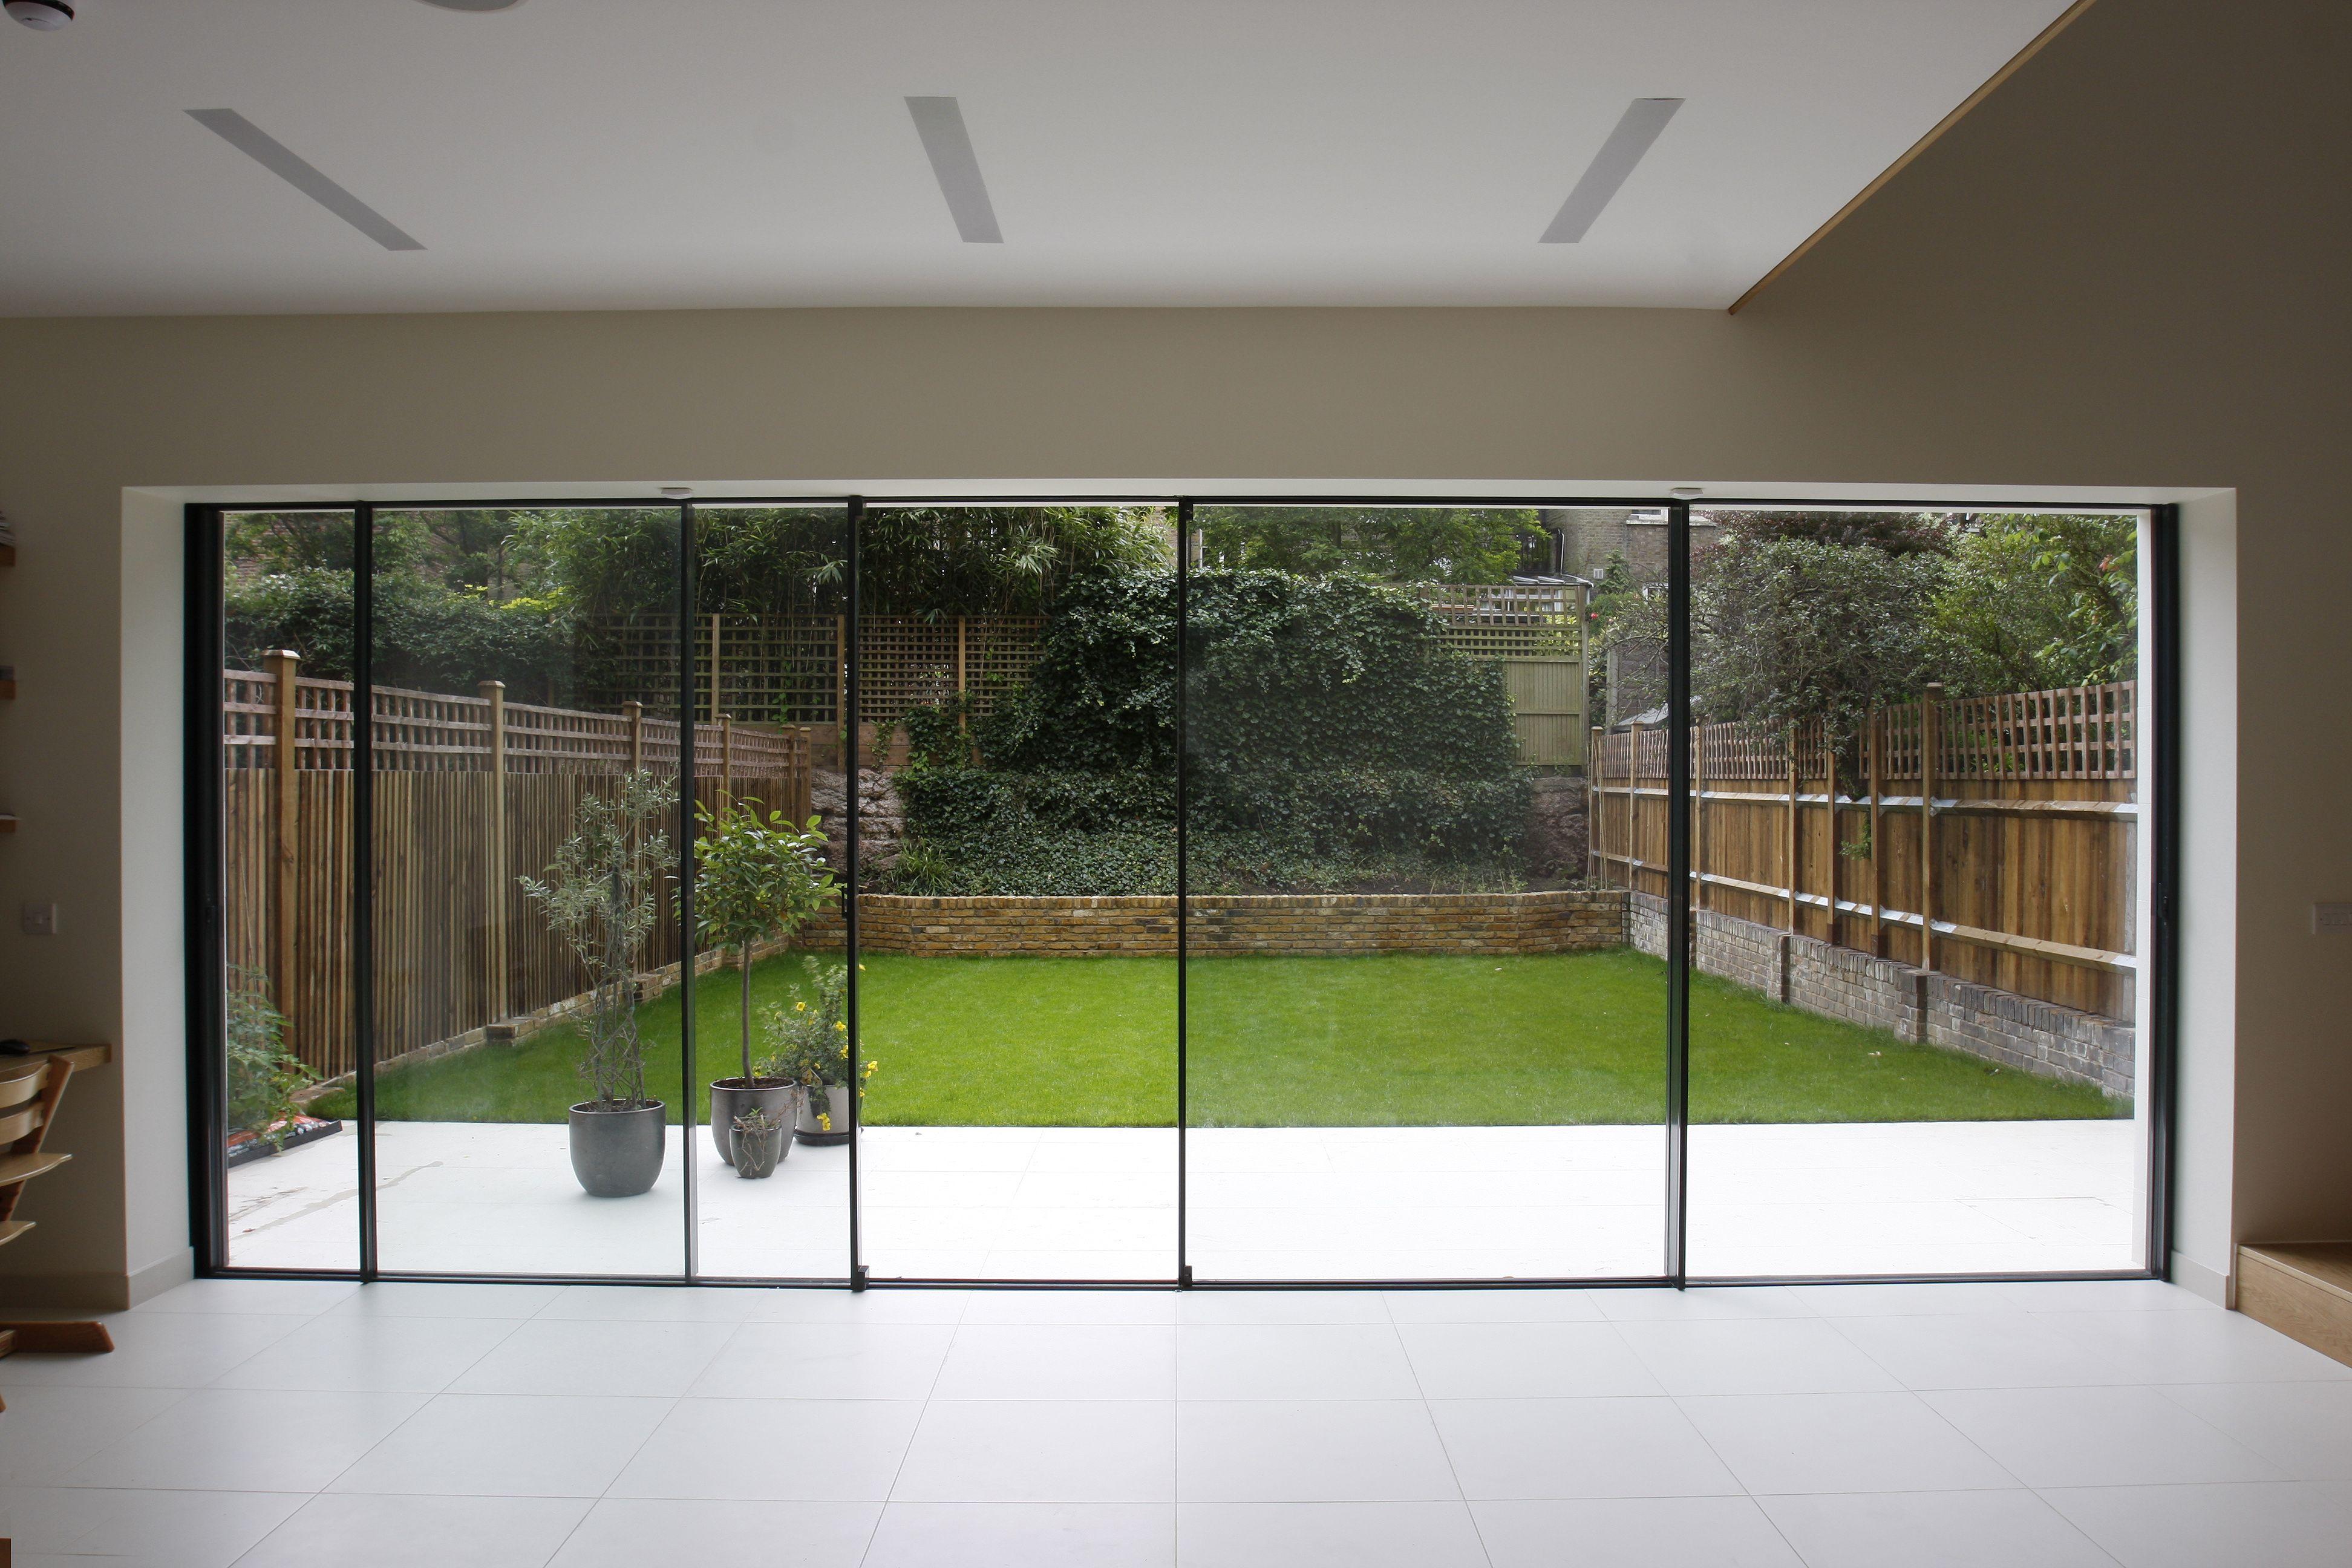 Best 25+ Bifold Glass Doors Ideas Only On Pinterest | Bi Fold Patio Doors,  Bifold Exterior Doors And Bi Fold Doors